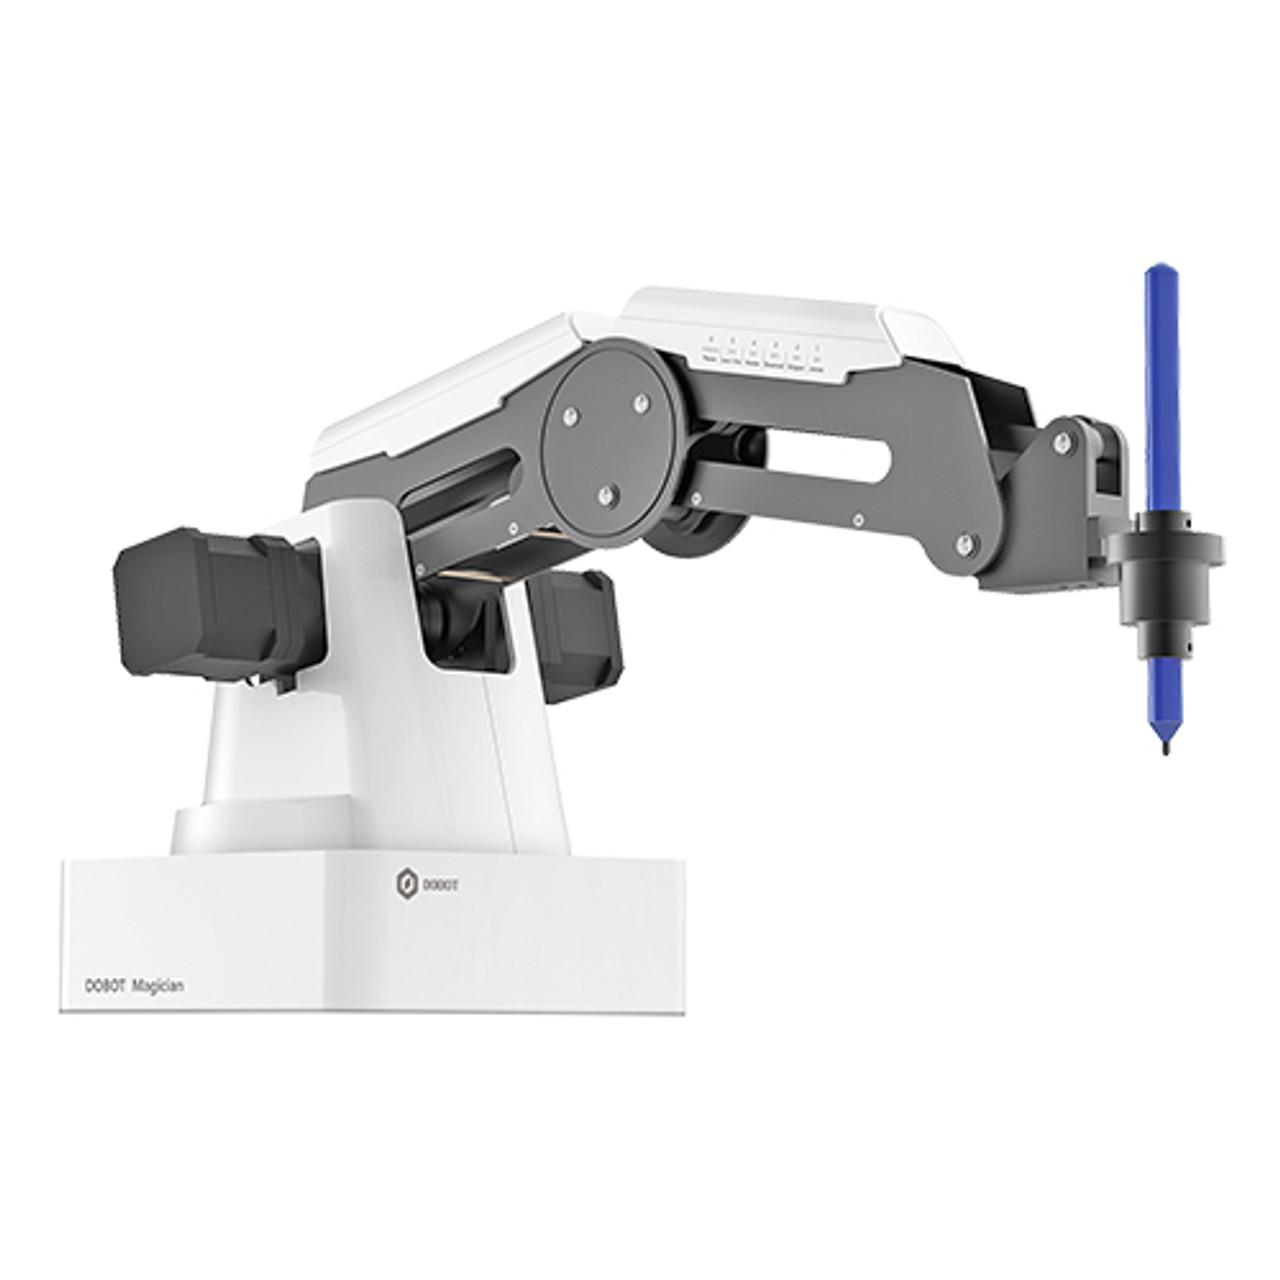 DOBOT Magician 4-Axis Robotic Arm